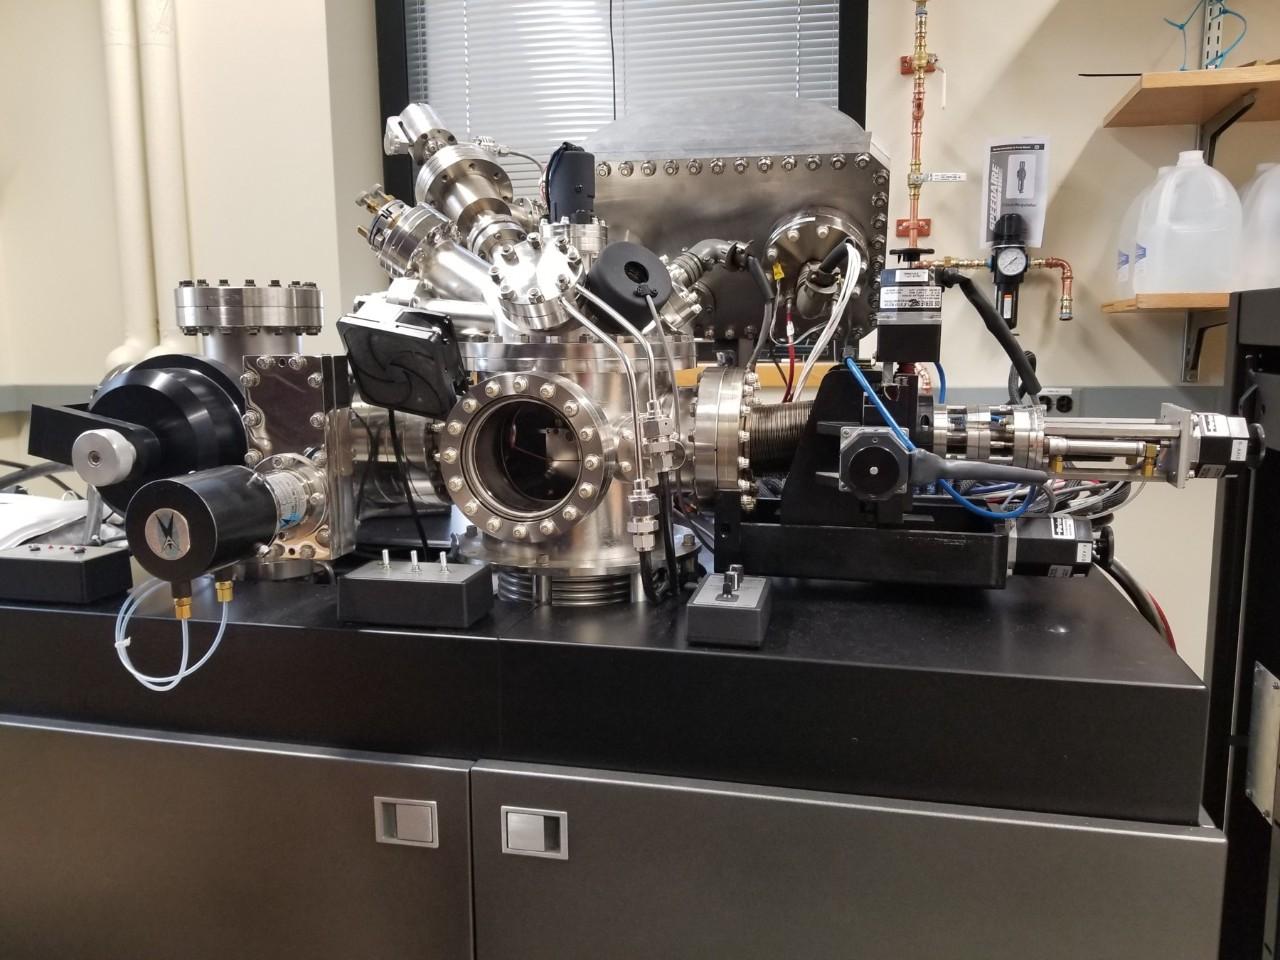 X-ray Crystallography - Facilities and Instrumentation